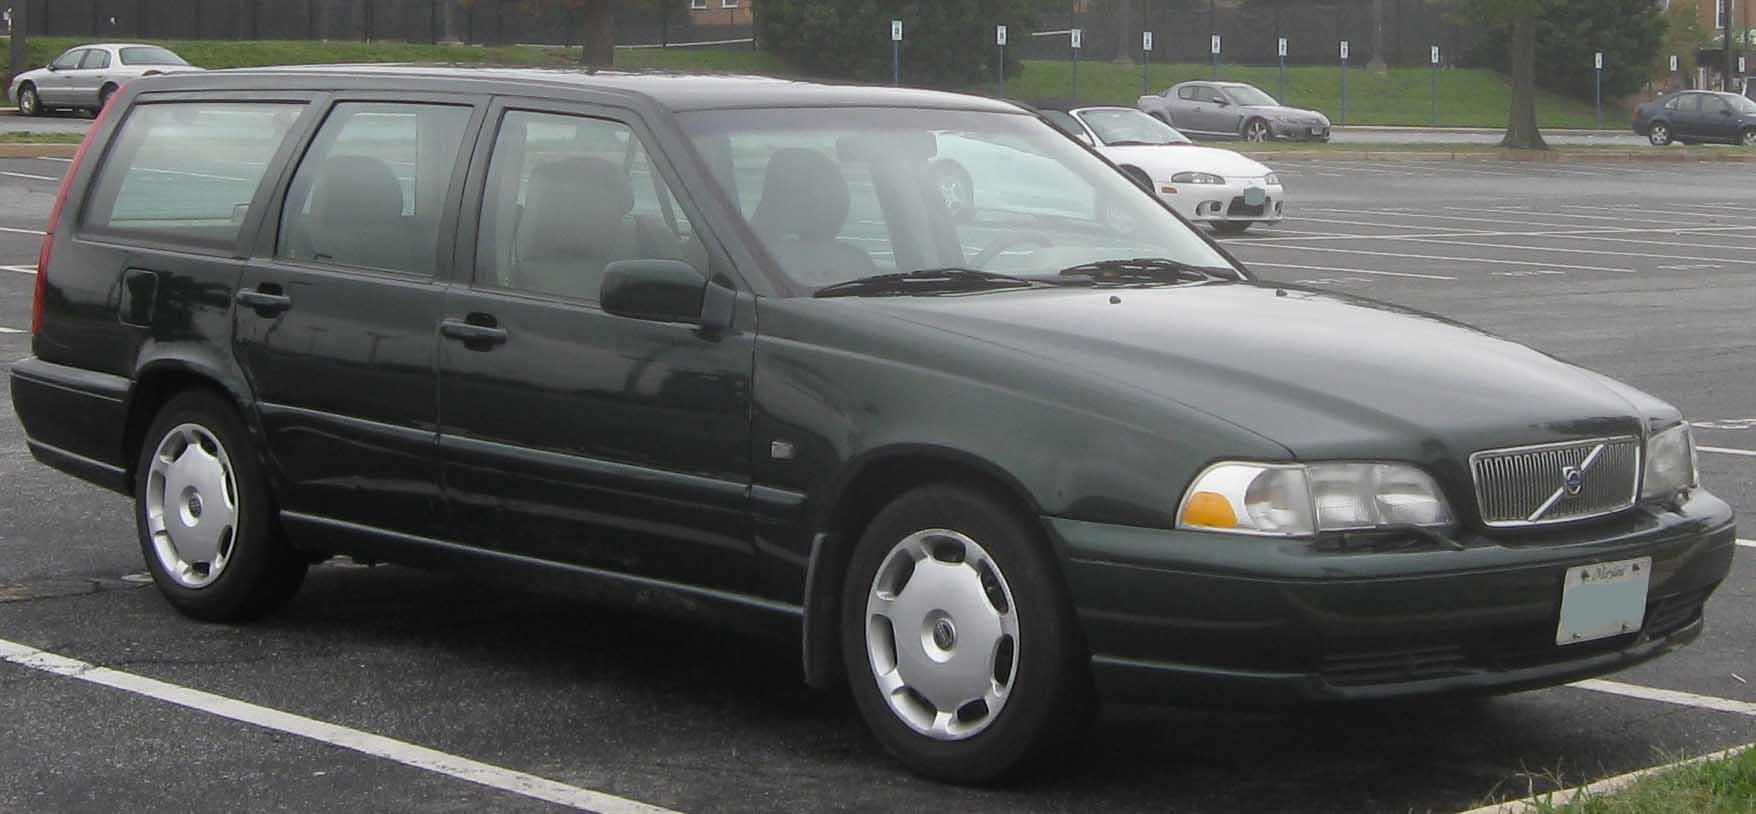 Volvo V70 I 1996 - 2000 Station wagon 5 door :: OUTSTANDING CARS